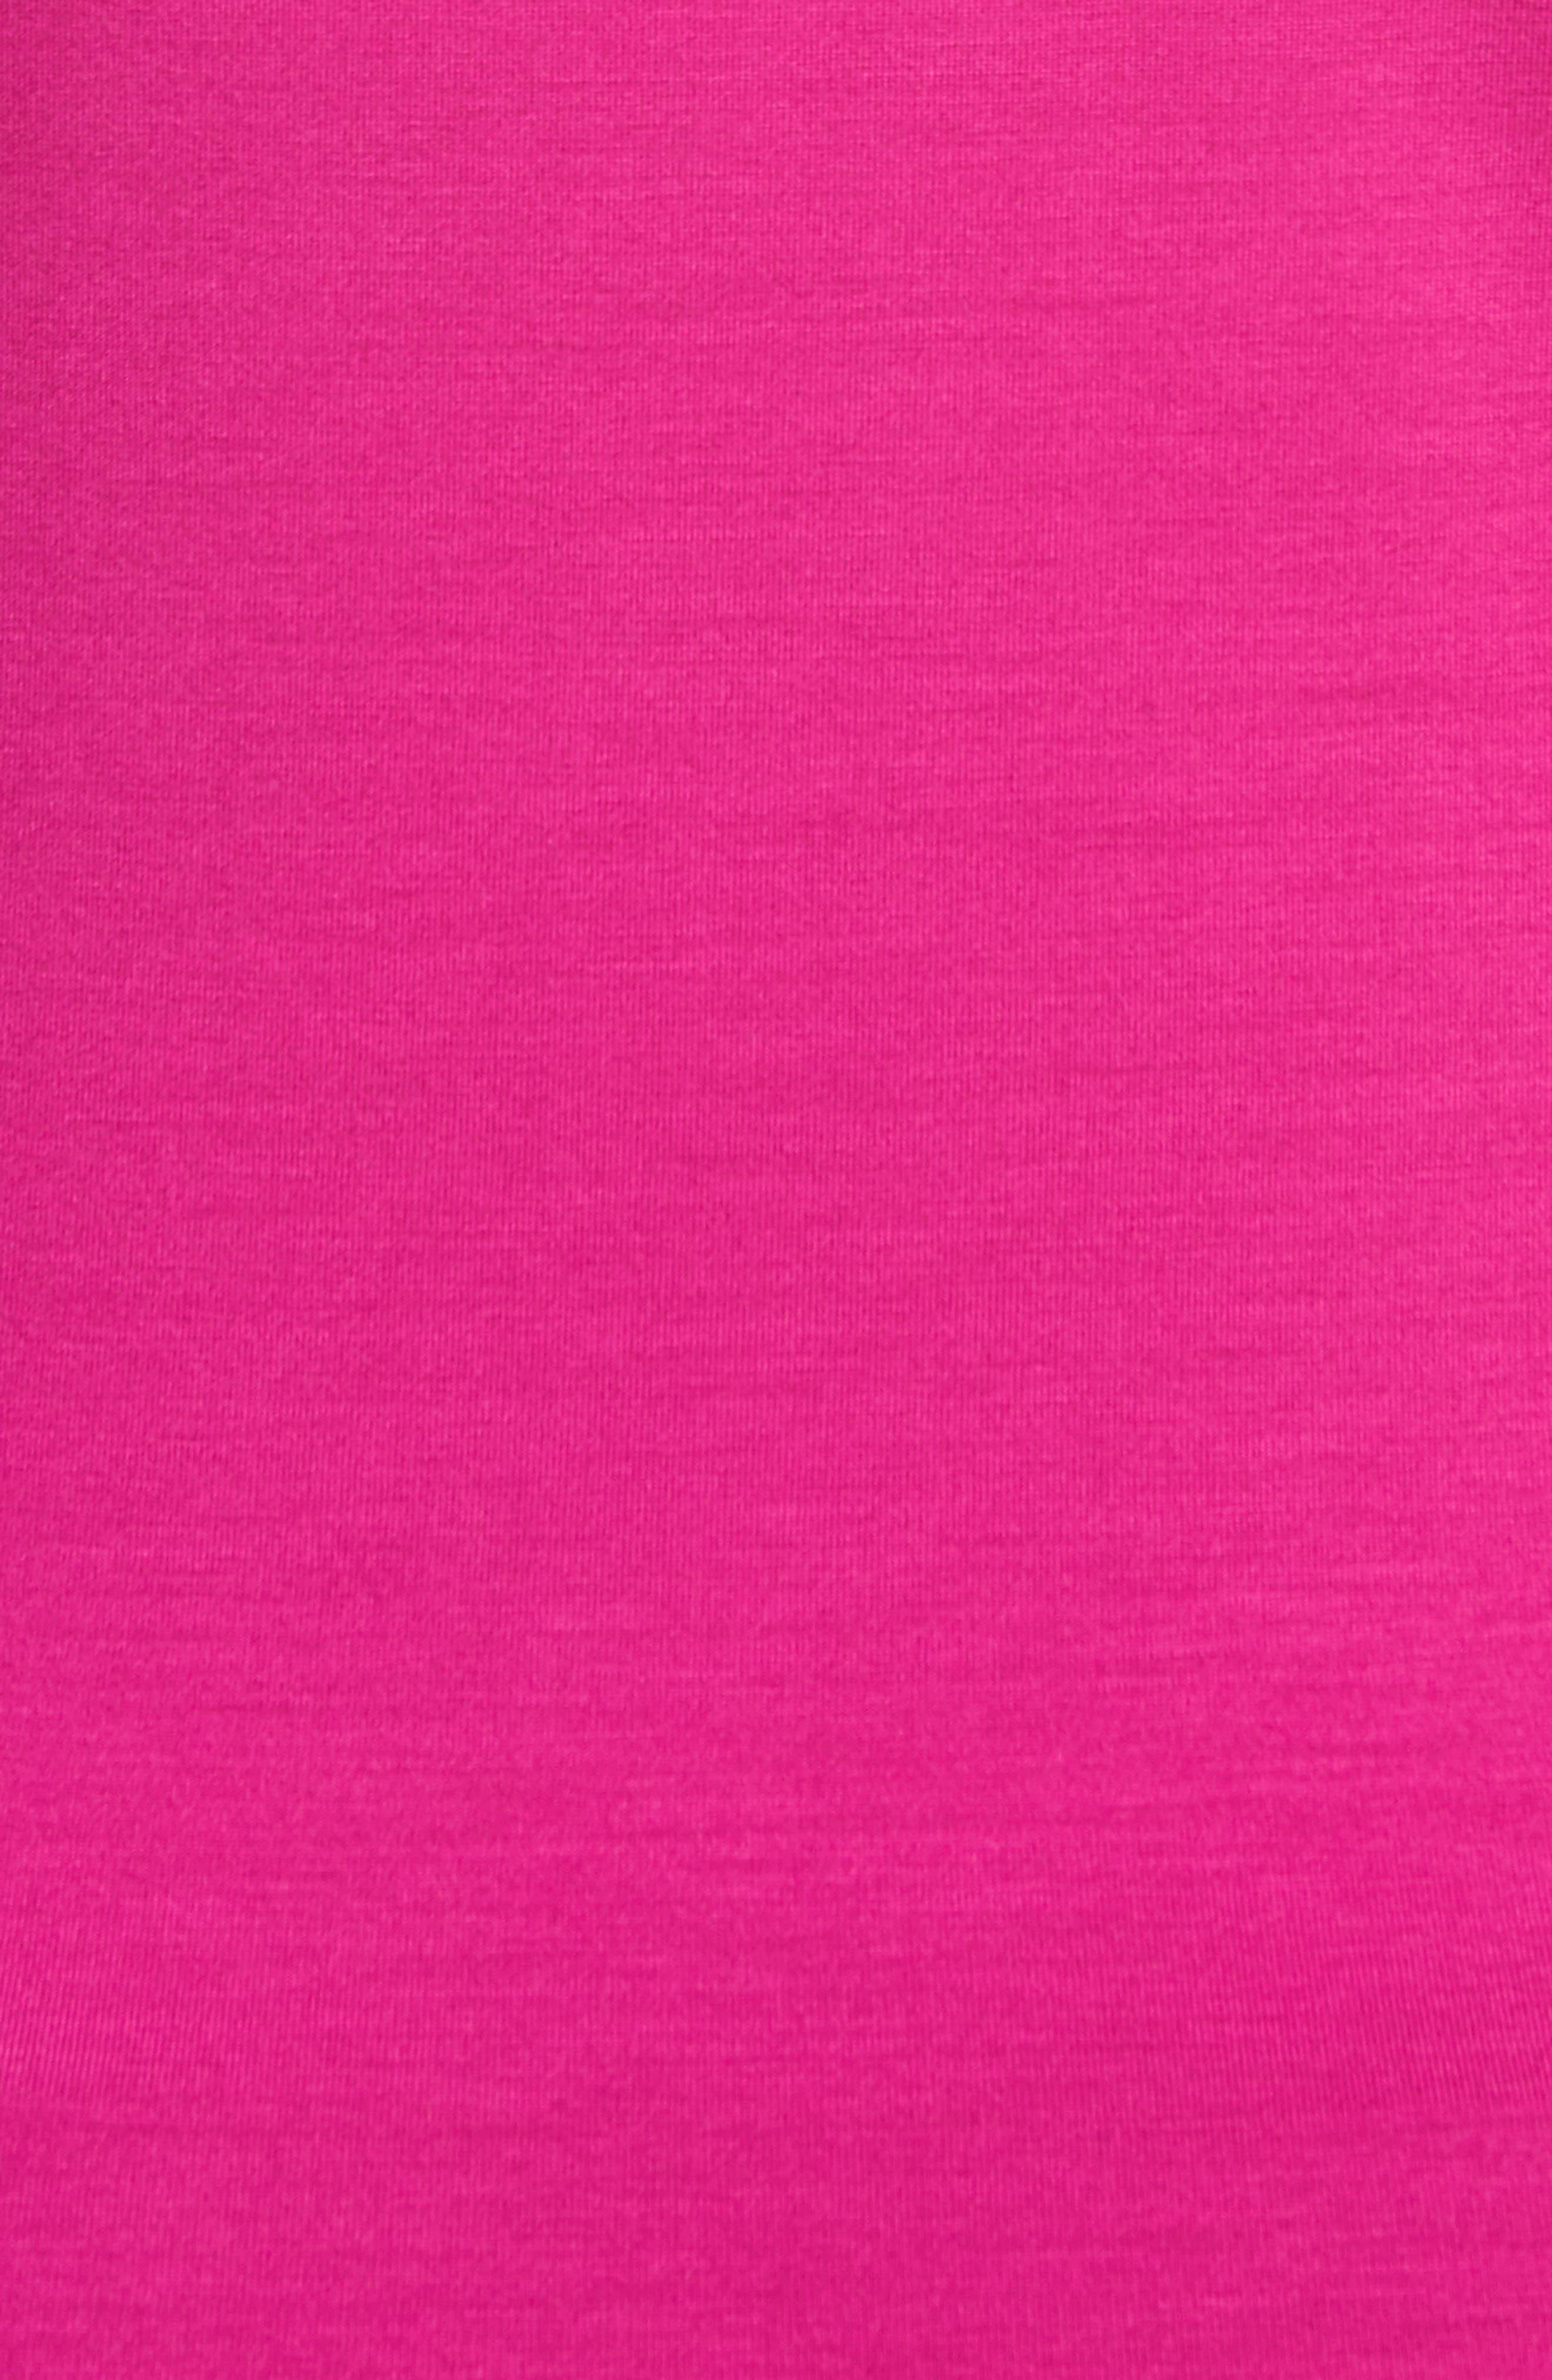 Alternate Image 3  - Armani Collezioni Stretch Jersey Top